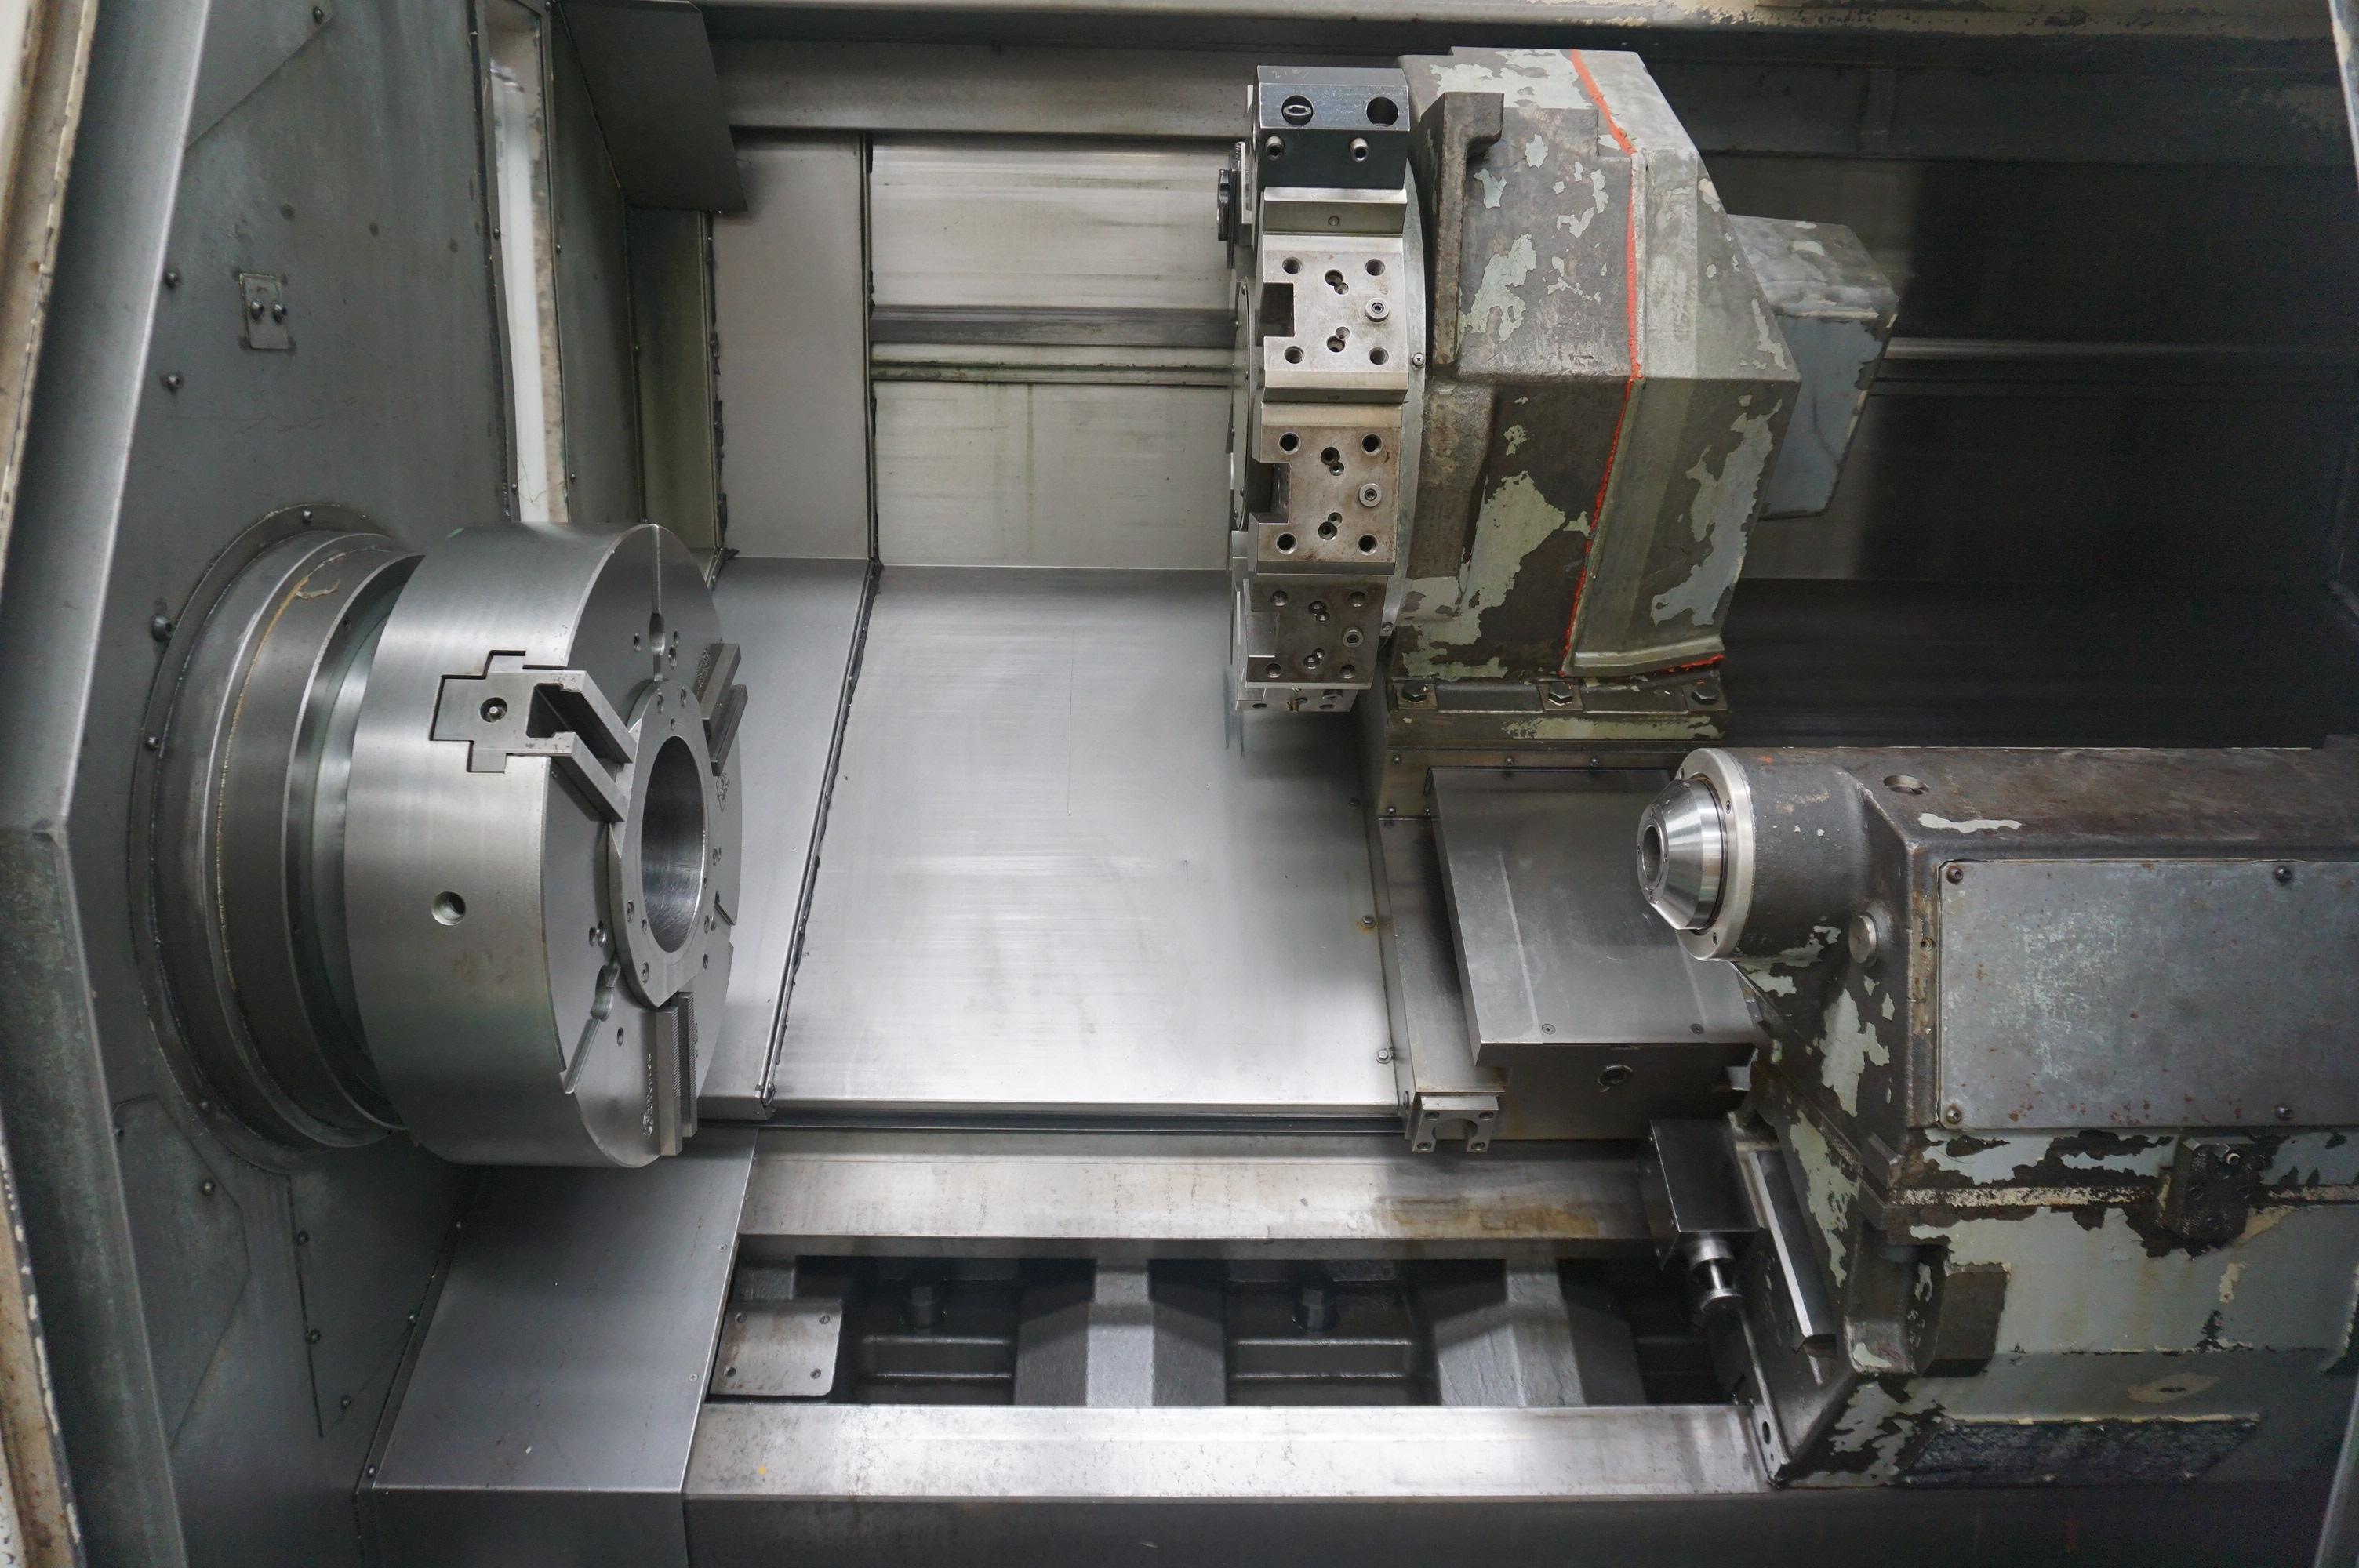 2001 Okuma LB35II 1SC/2000 - CNC Horizontal Lathe